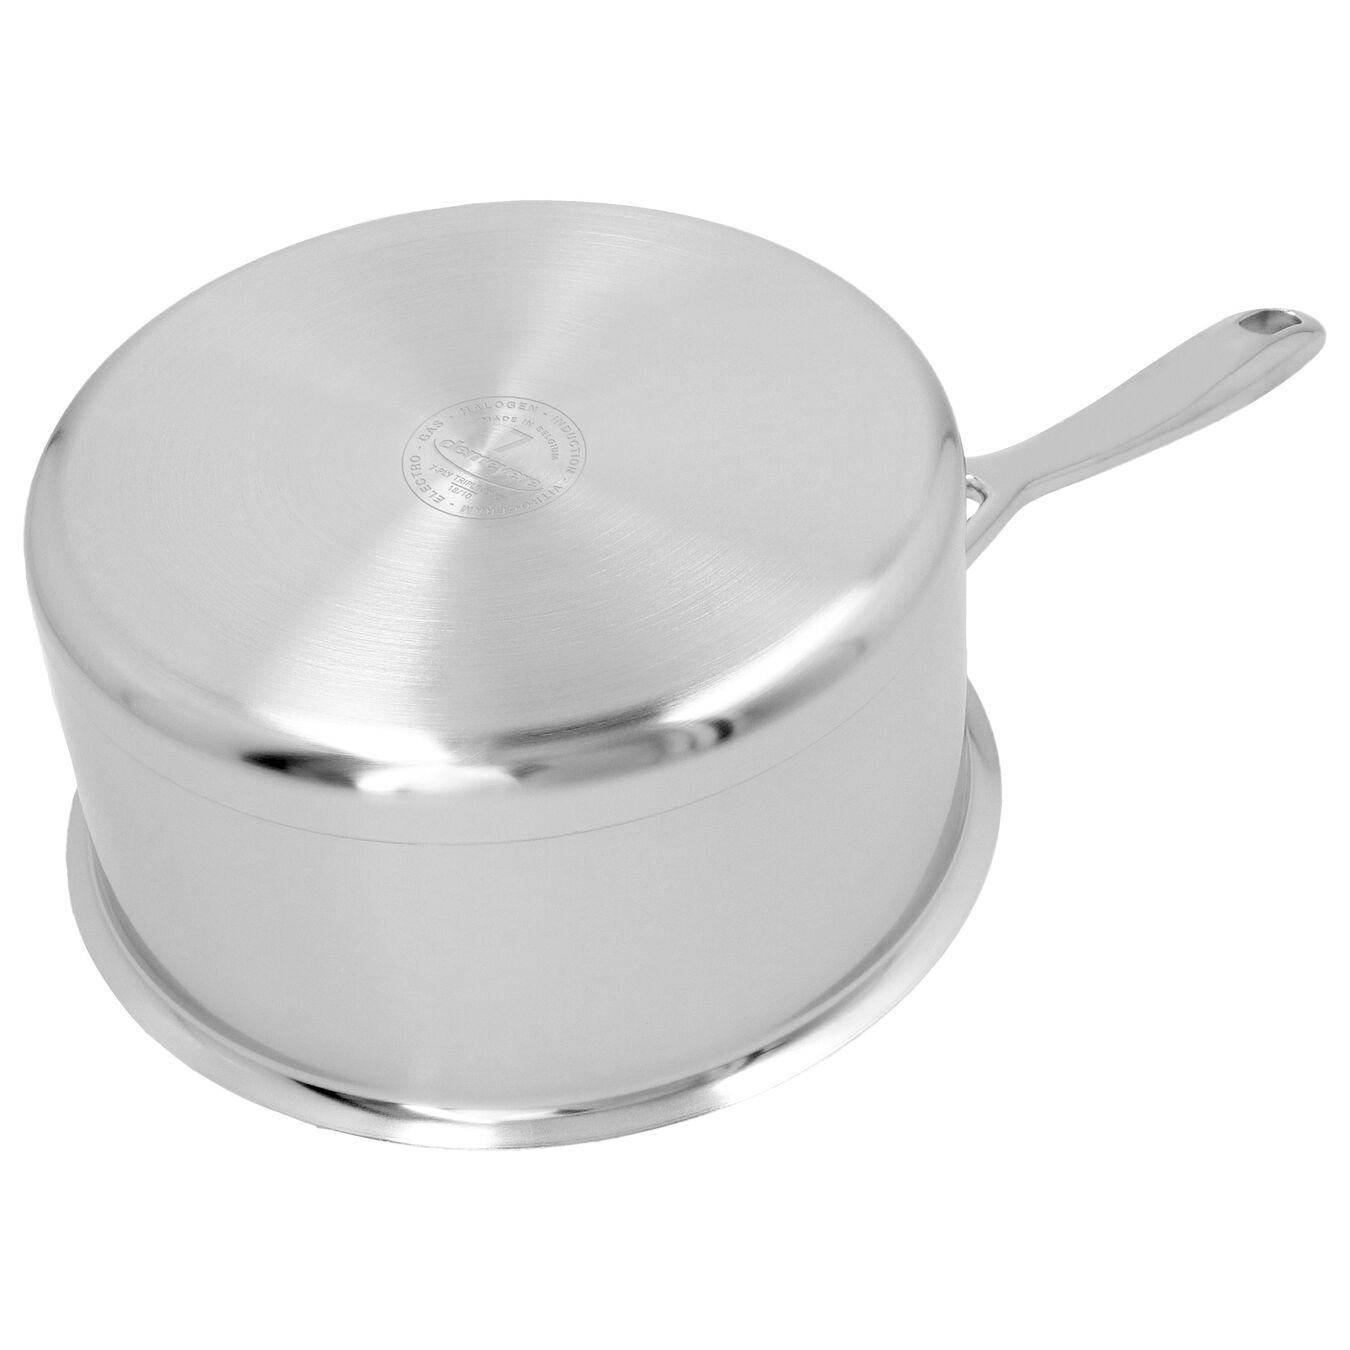 Steelpan zonder deksel 18 cm / 2.2 l,,large 2